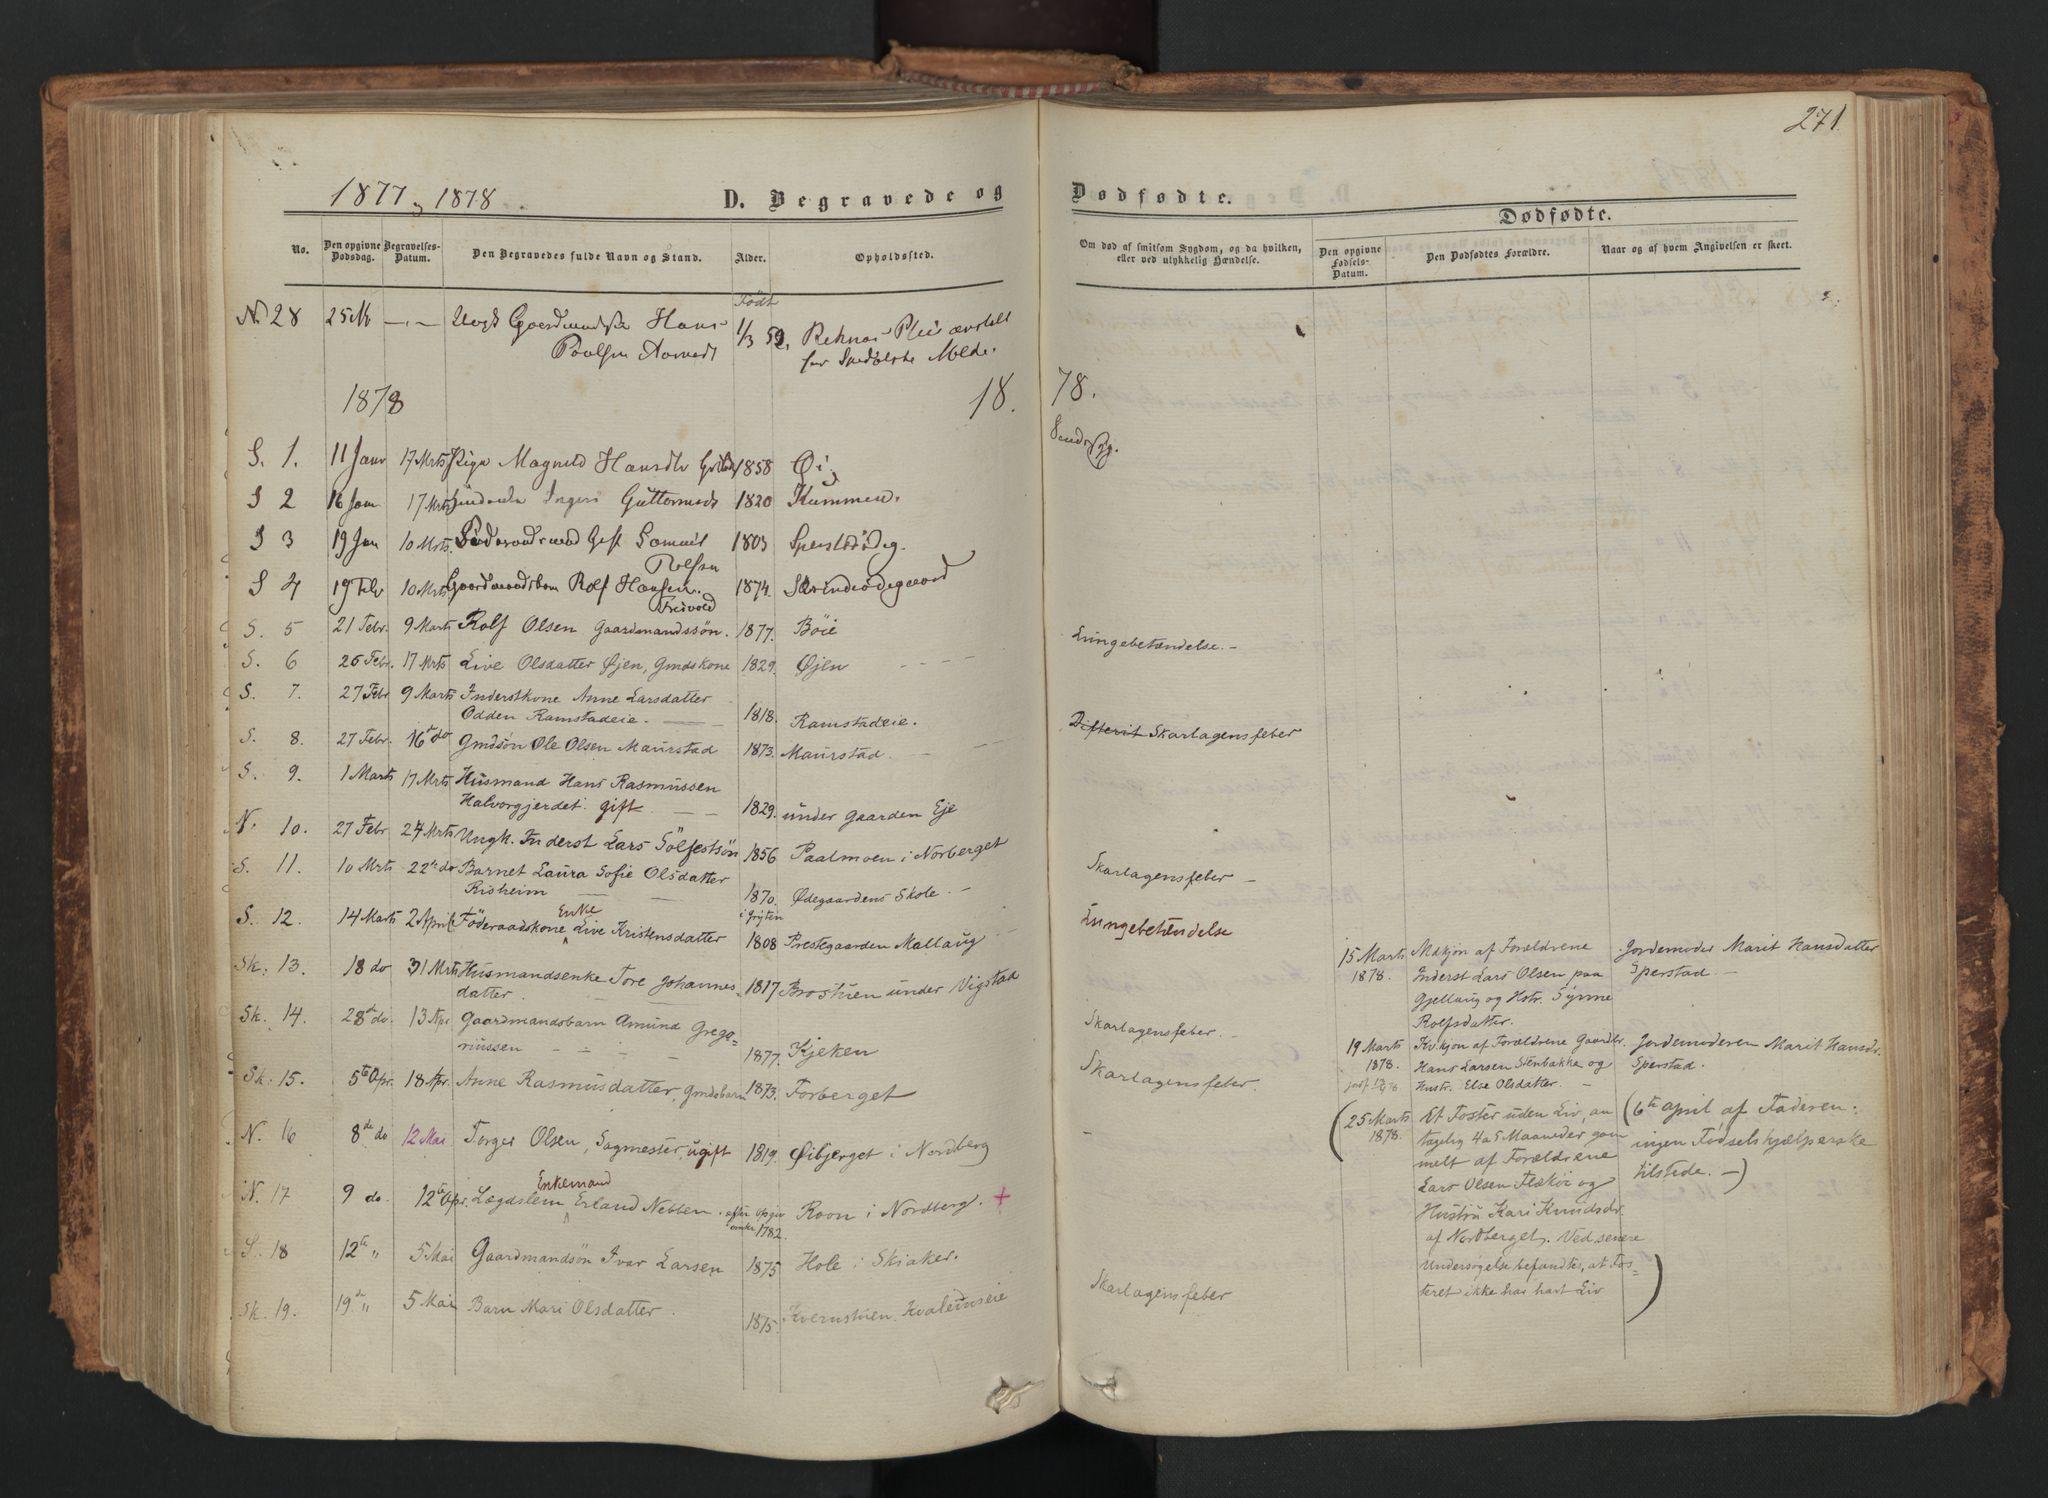 SAH, Skjåk prestekontor, Ministerialbok nr. 1, 1863-1879, s. 271